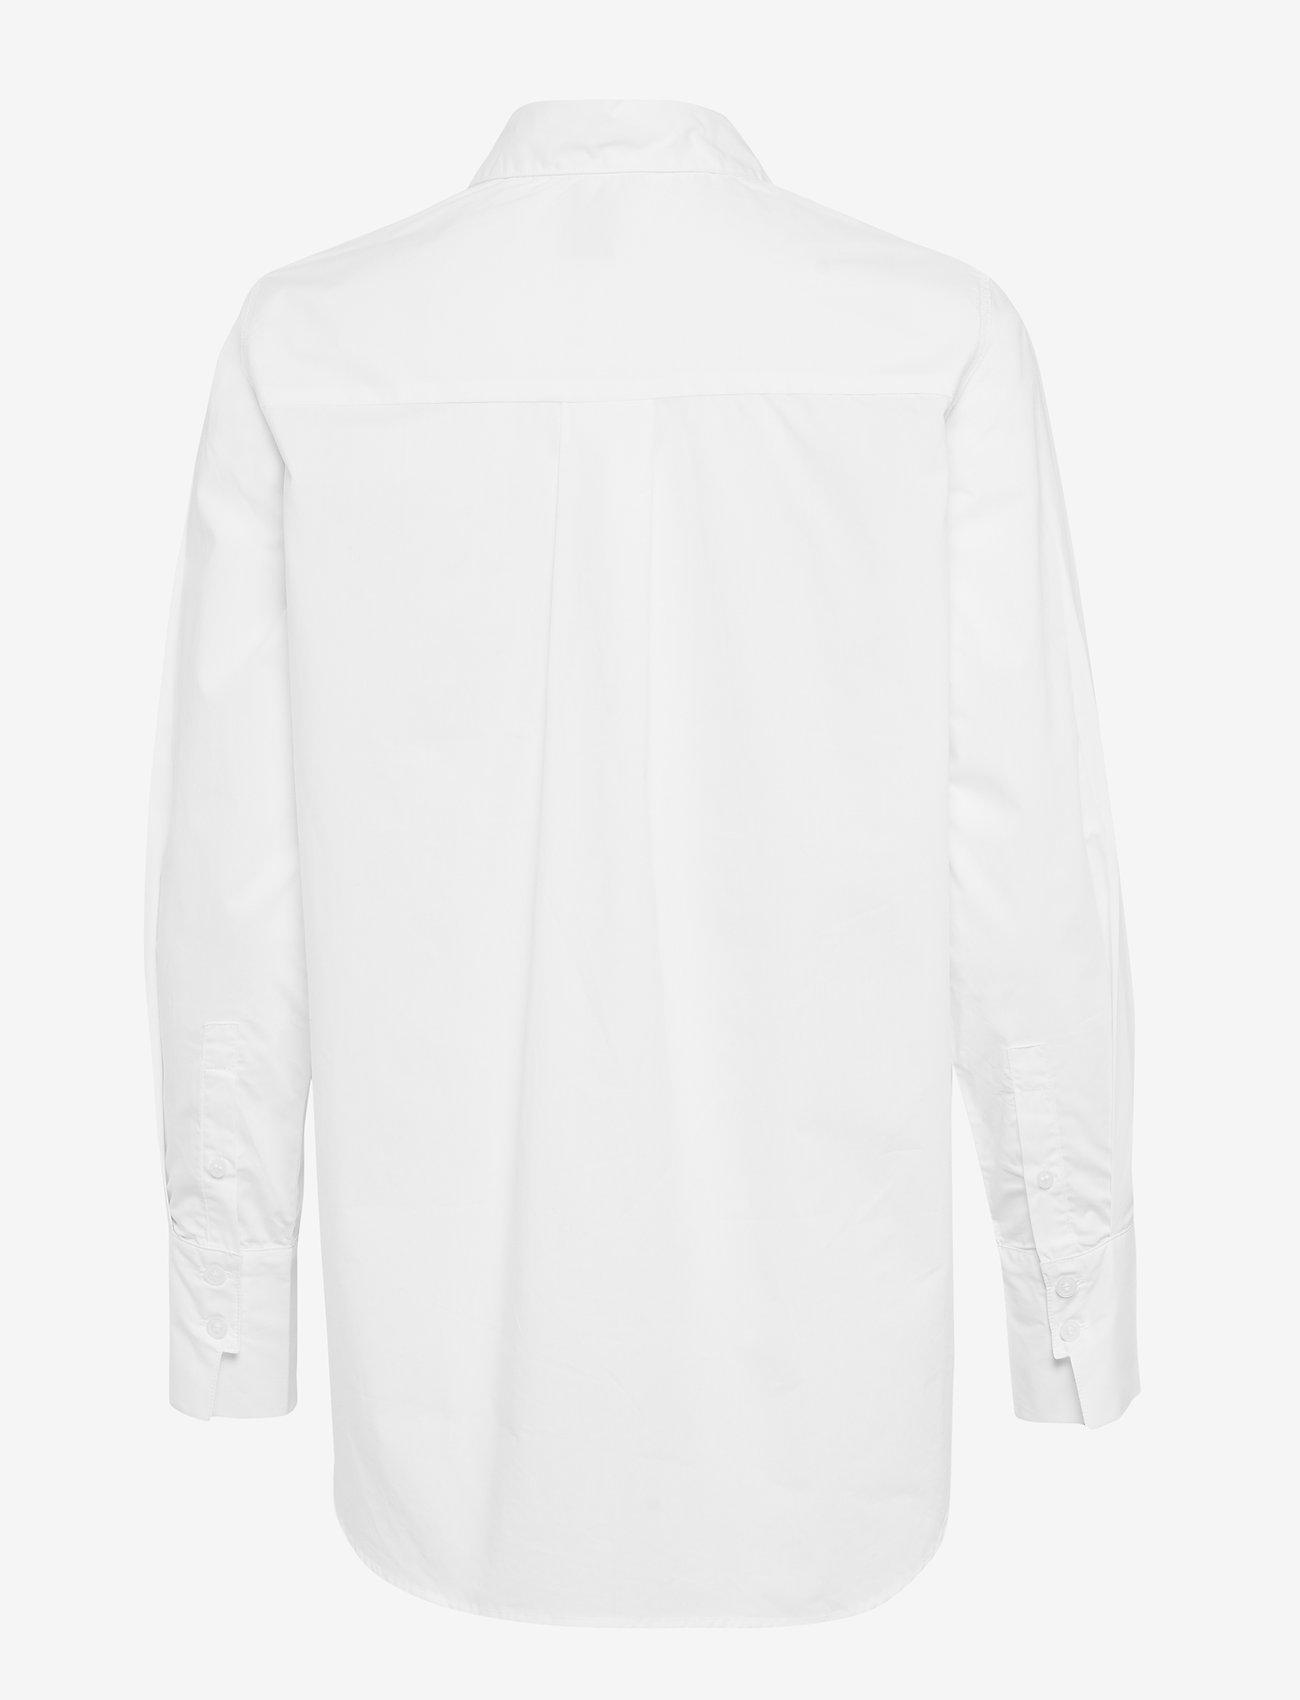 Lindex Shirt Fiona- Chemisier & Chemises zpqDWzb0 UT3TL VhYs74BA